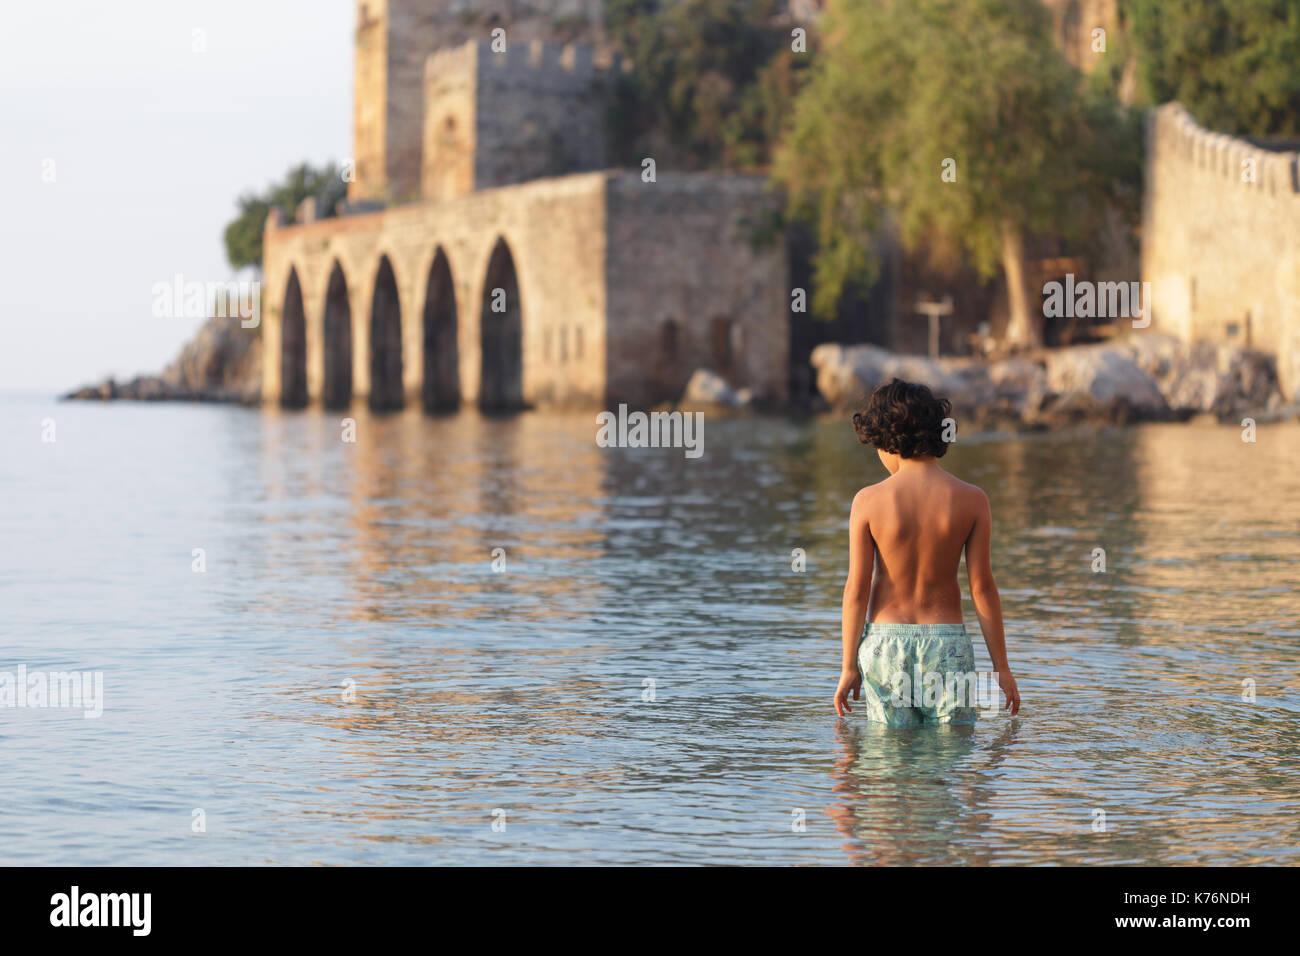 Backview of portrait of boy with dark hair wearing swimwear standing in water near Alanya medieval shipyard in mediterrarian sea - Stock Image